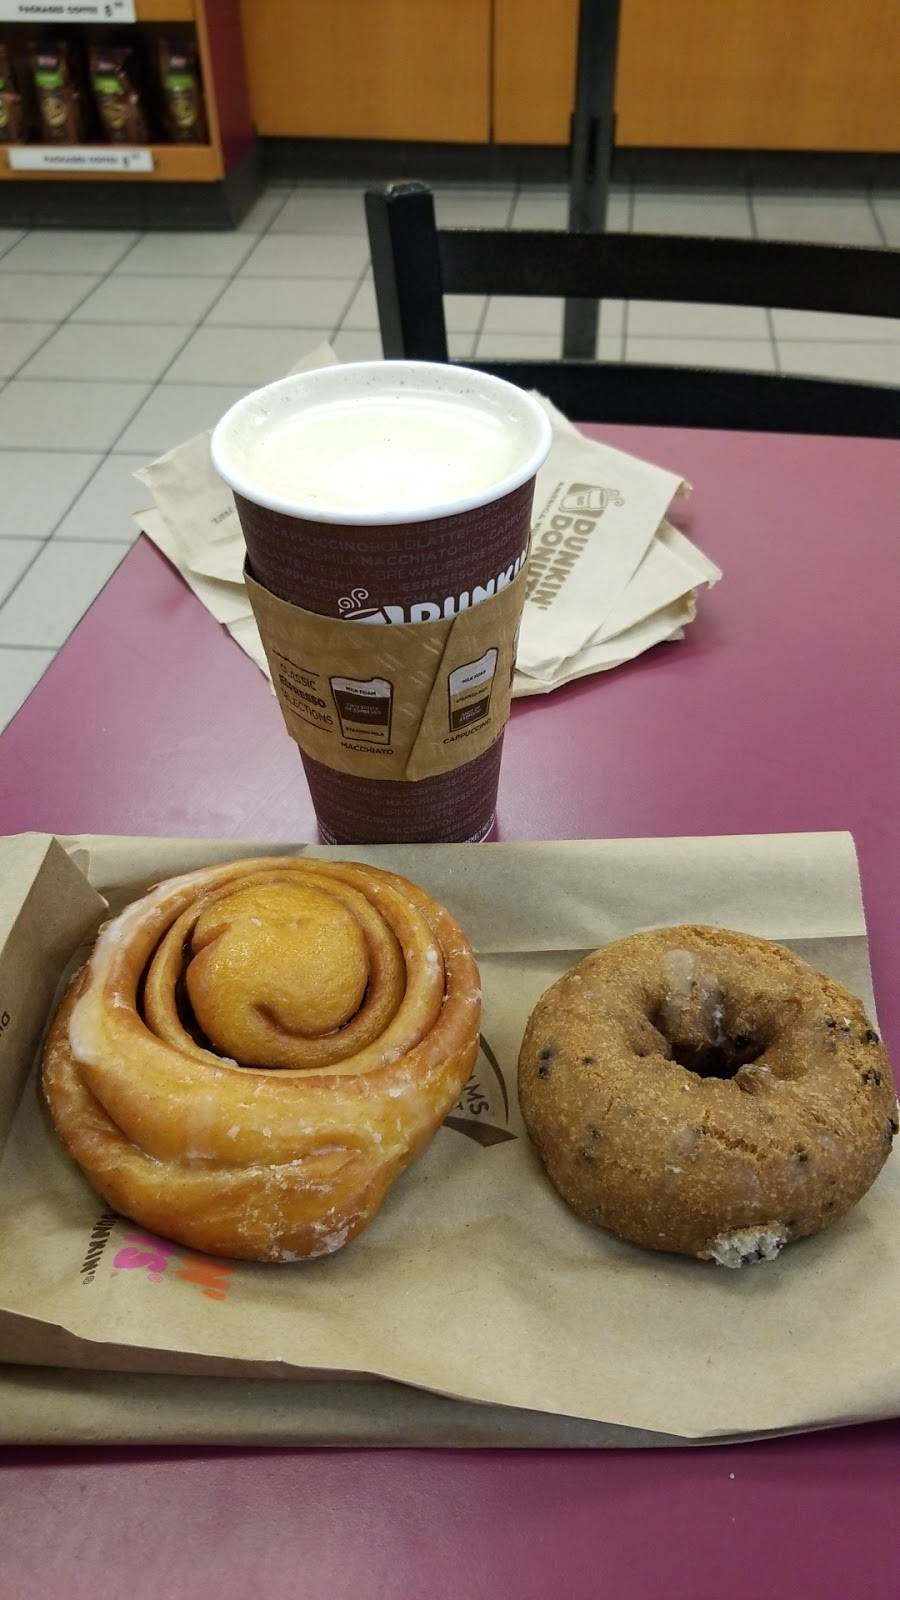 Dunkin | bakery | 1485 S Dixie Hwy, Florida City, FL 33034, USA | 3052469896 OR +1 305-246-9896